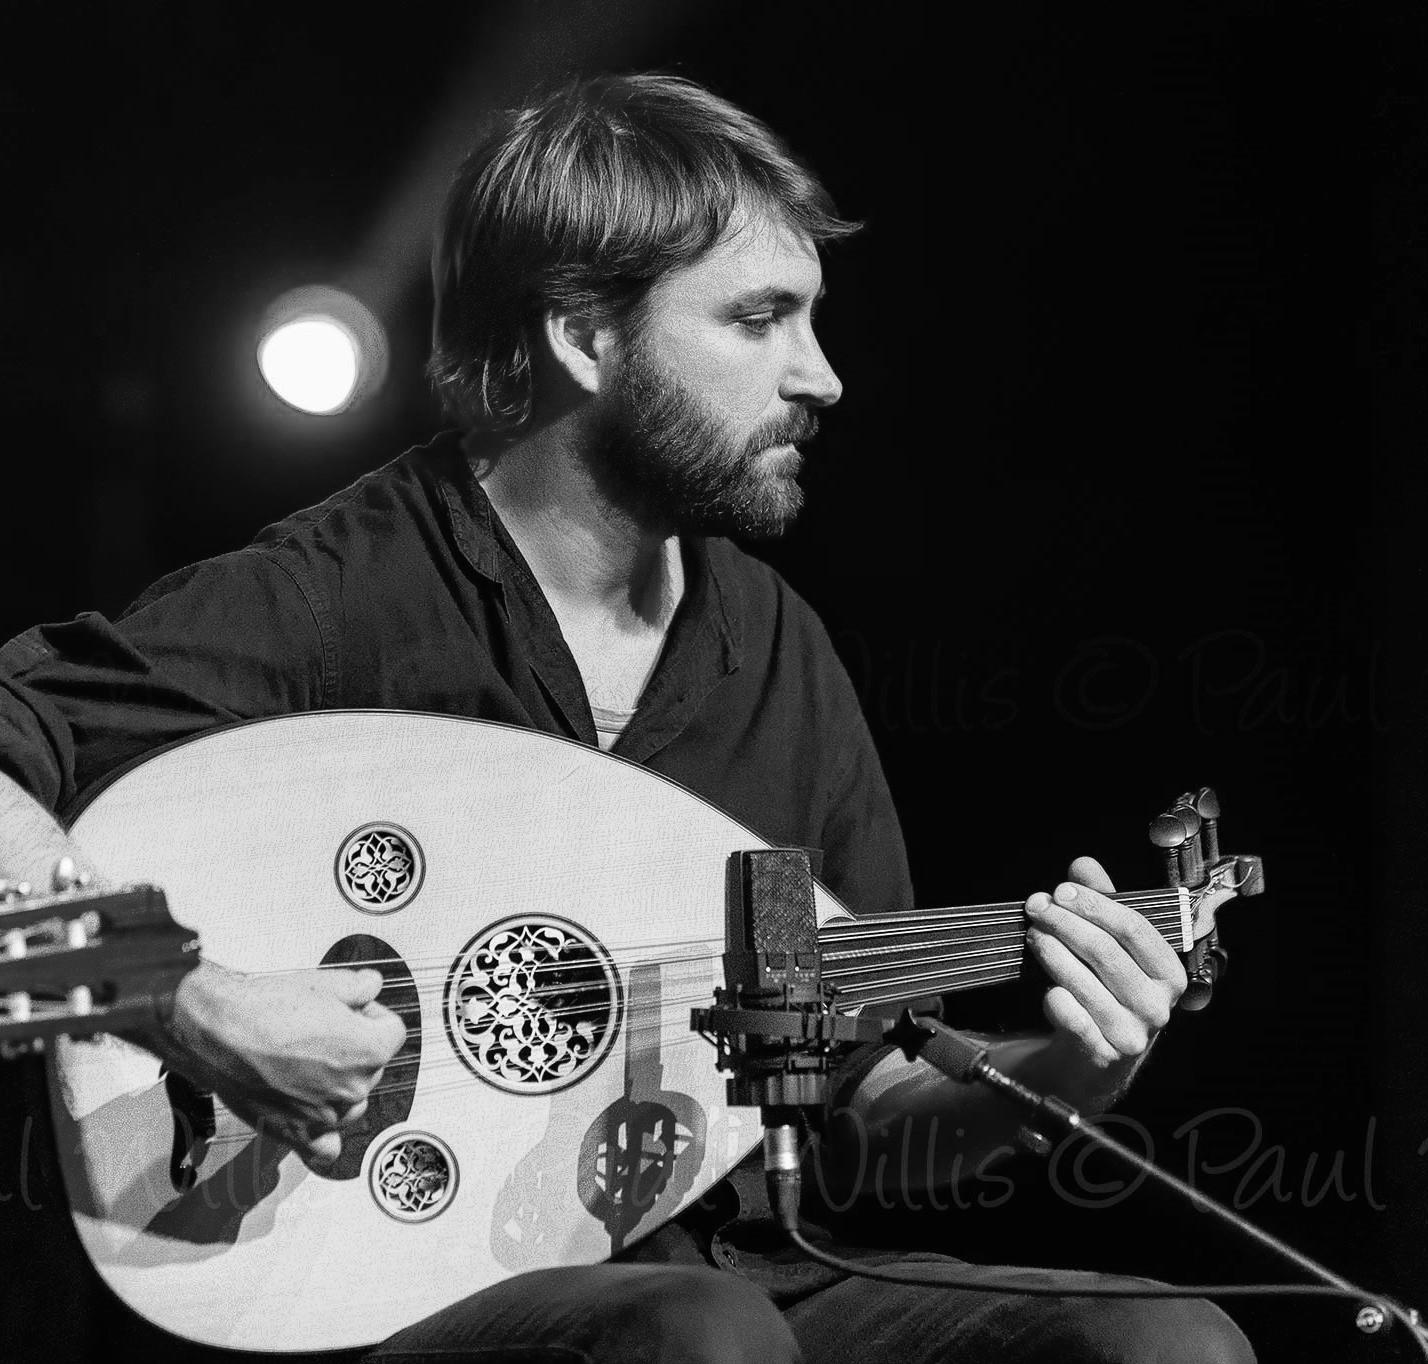 Florian Uzâk